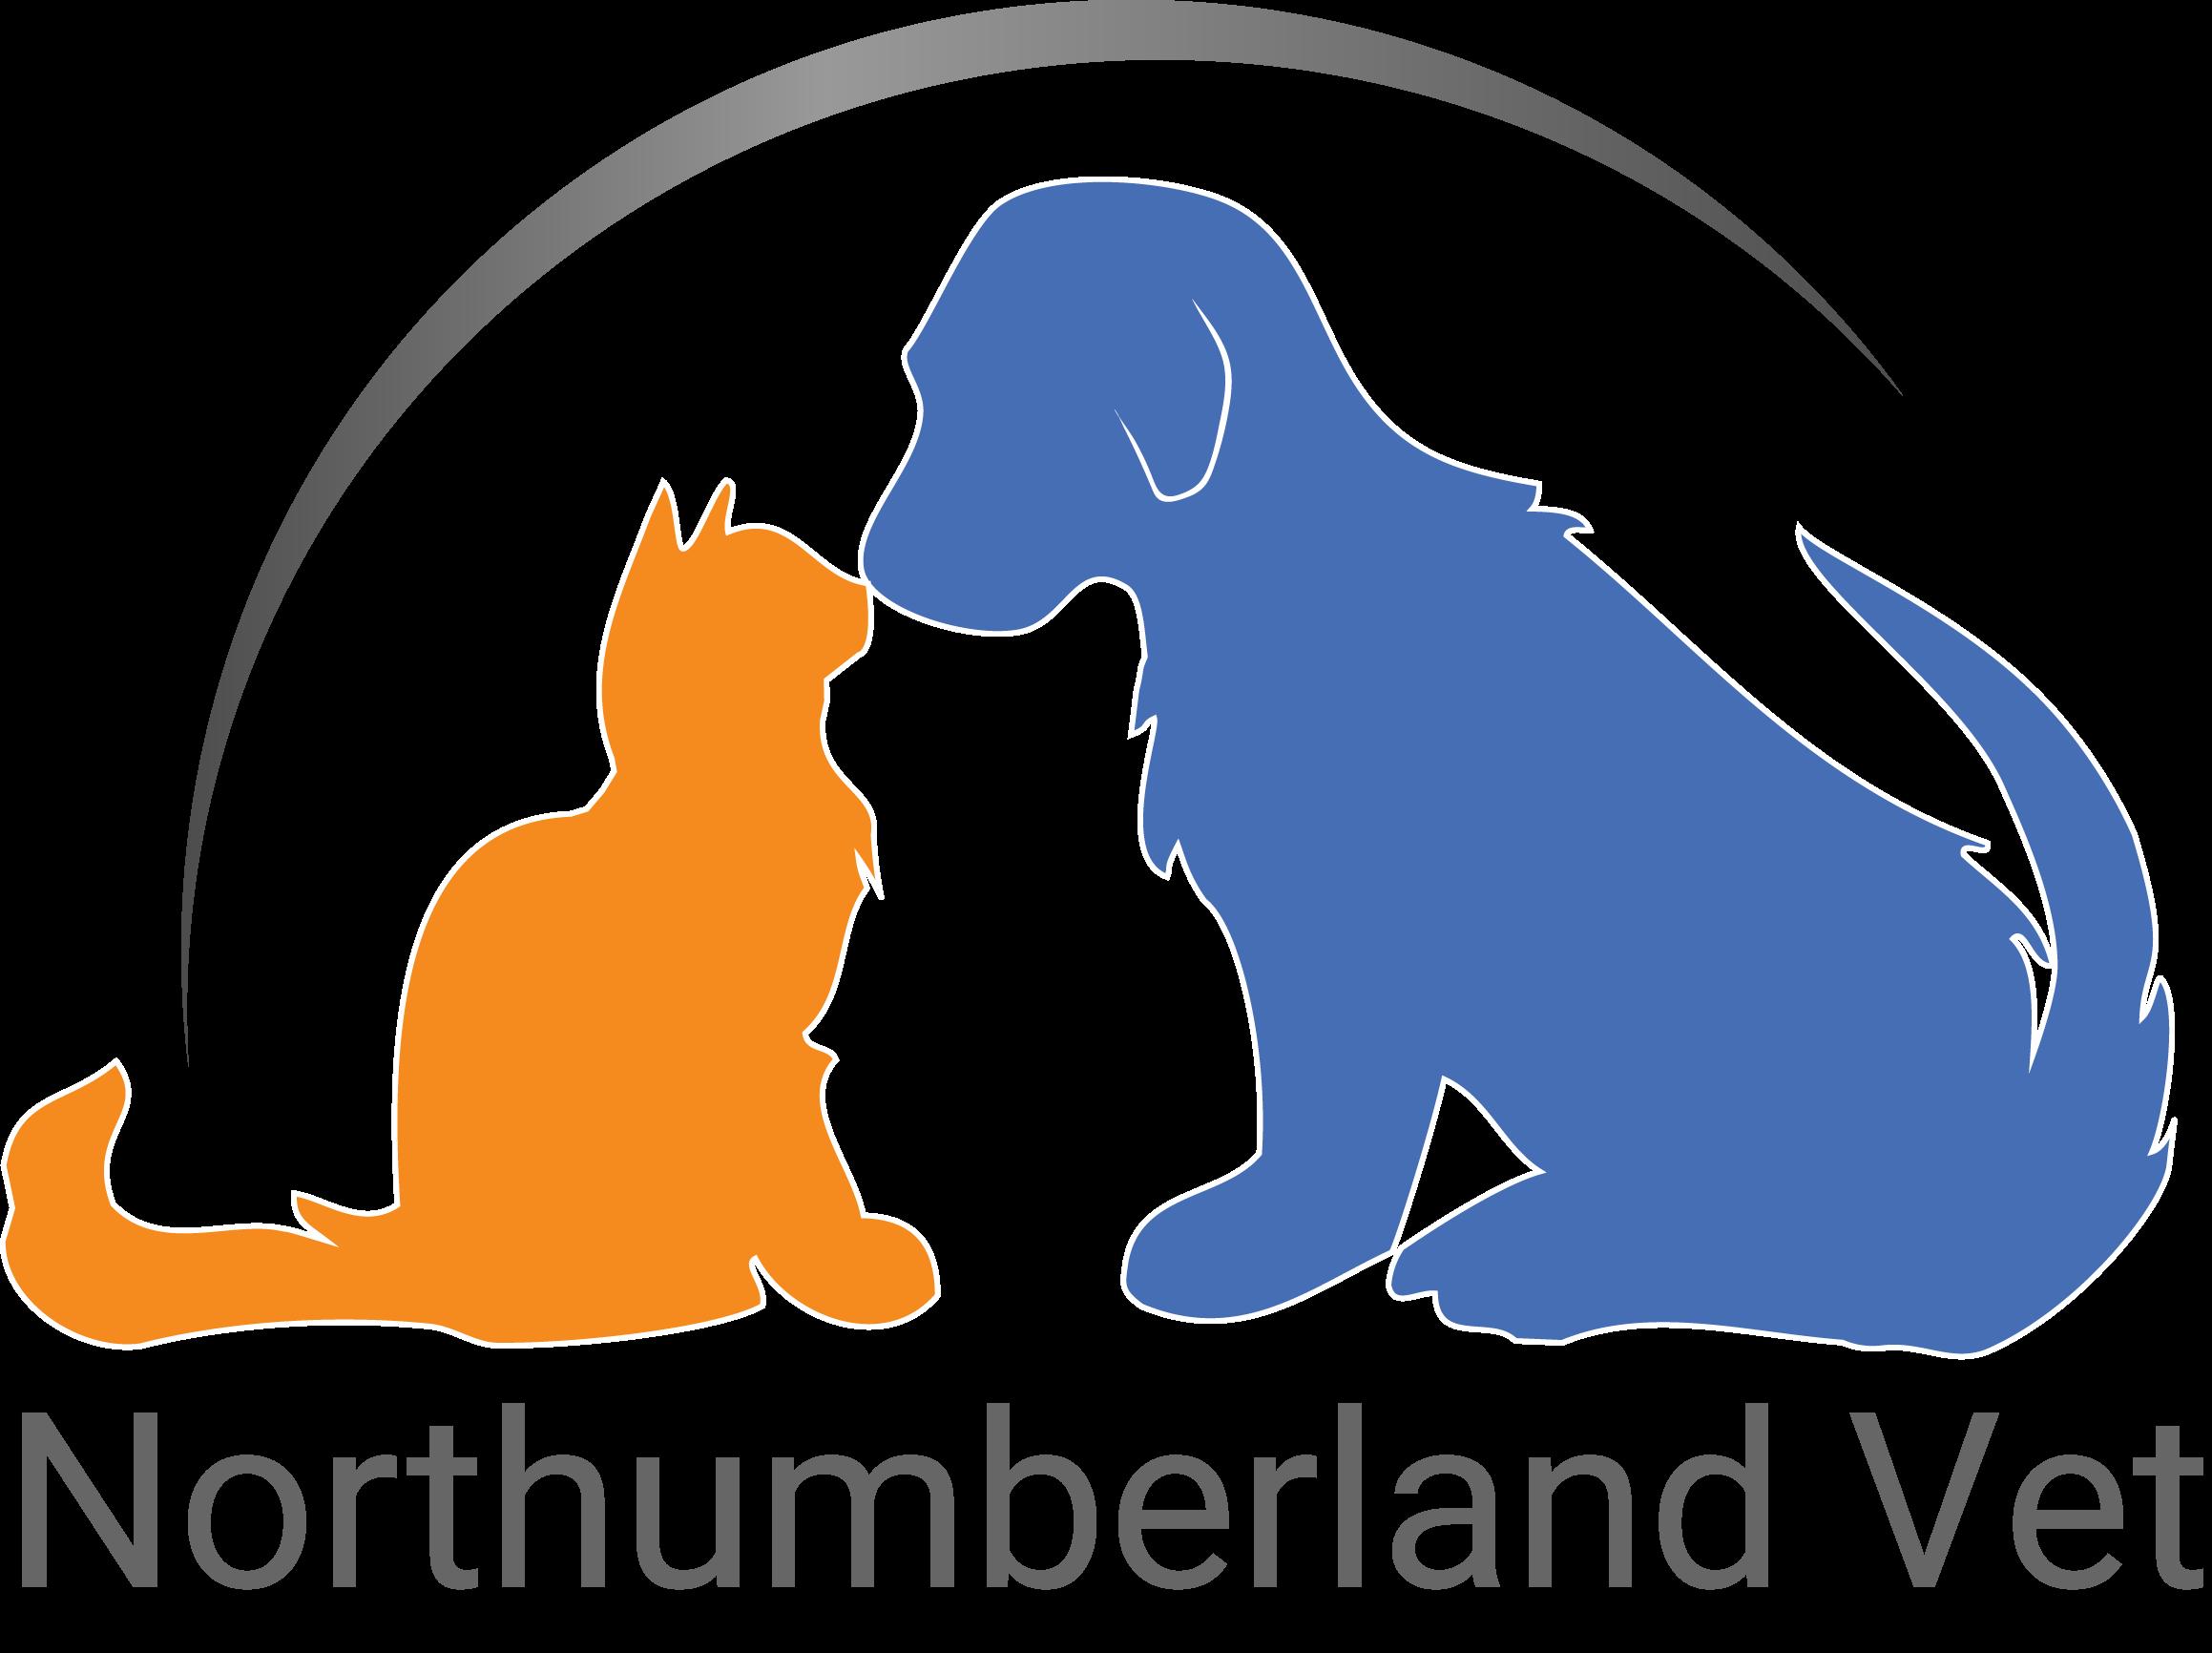 Veterinarian clipart service animal. Northumberland veterinary services